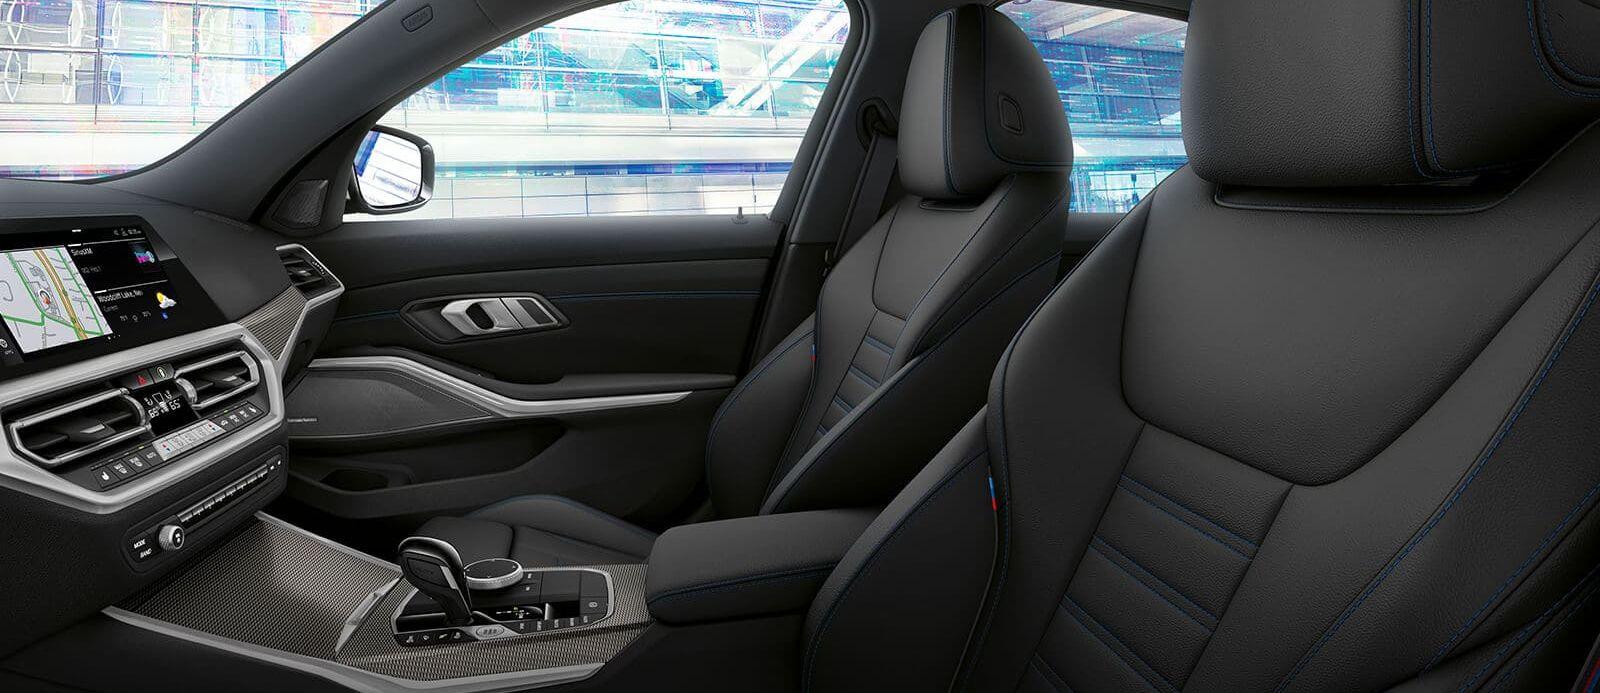 2019 BMW 3 Series Comfortable Seating